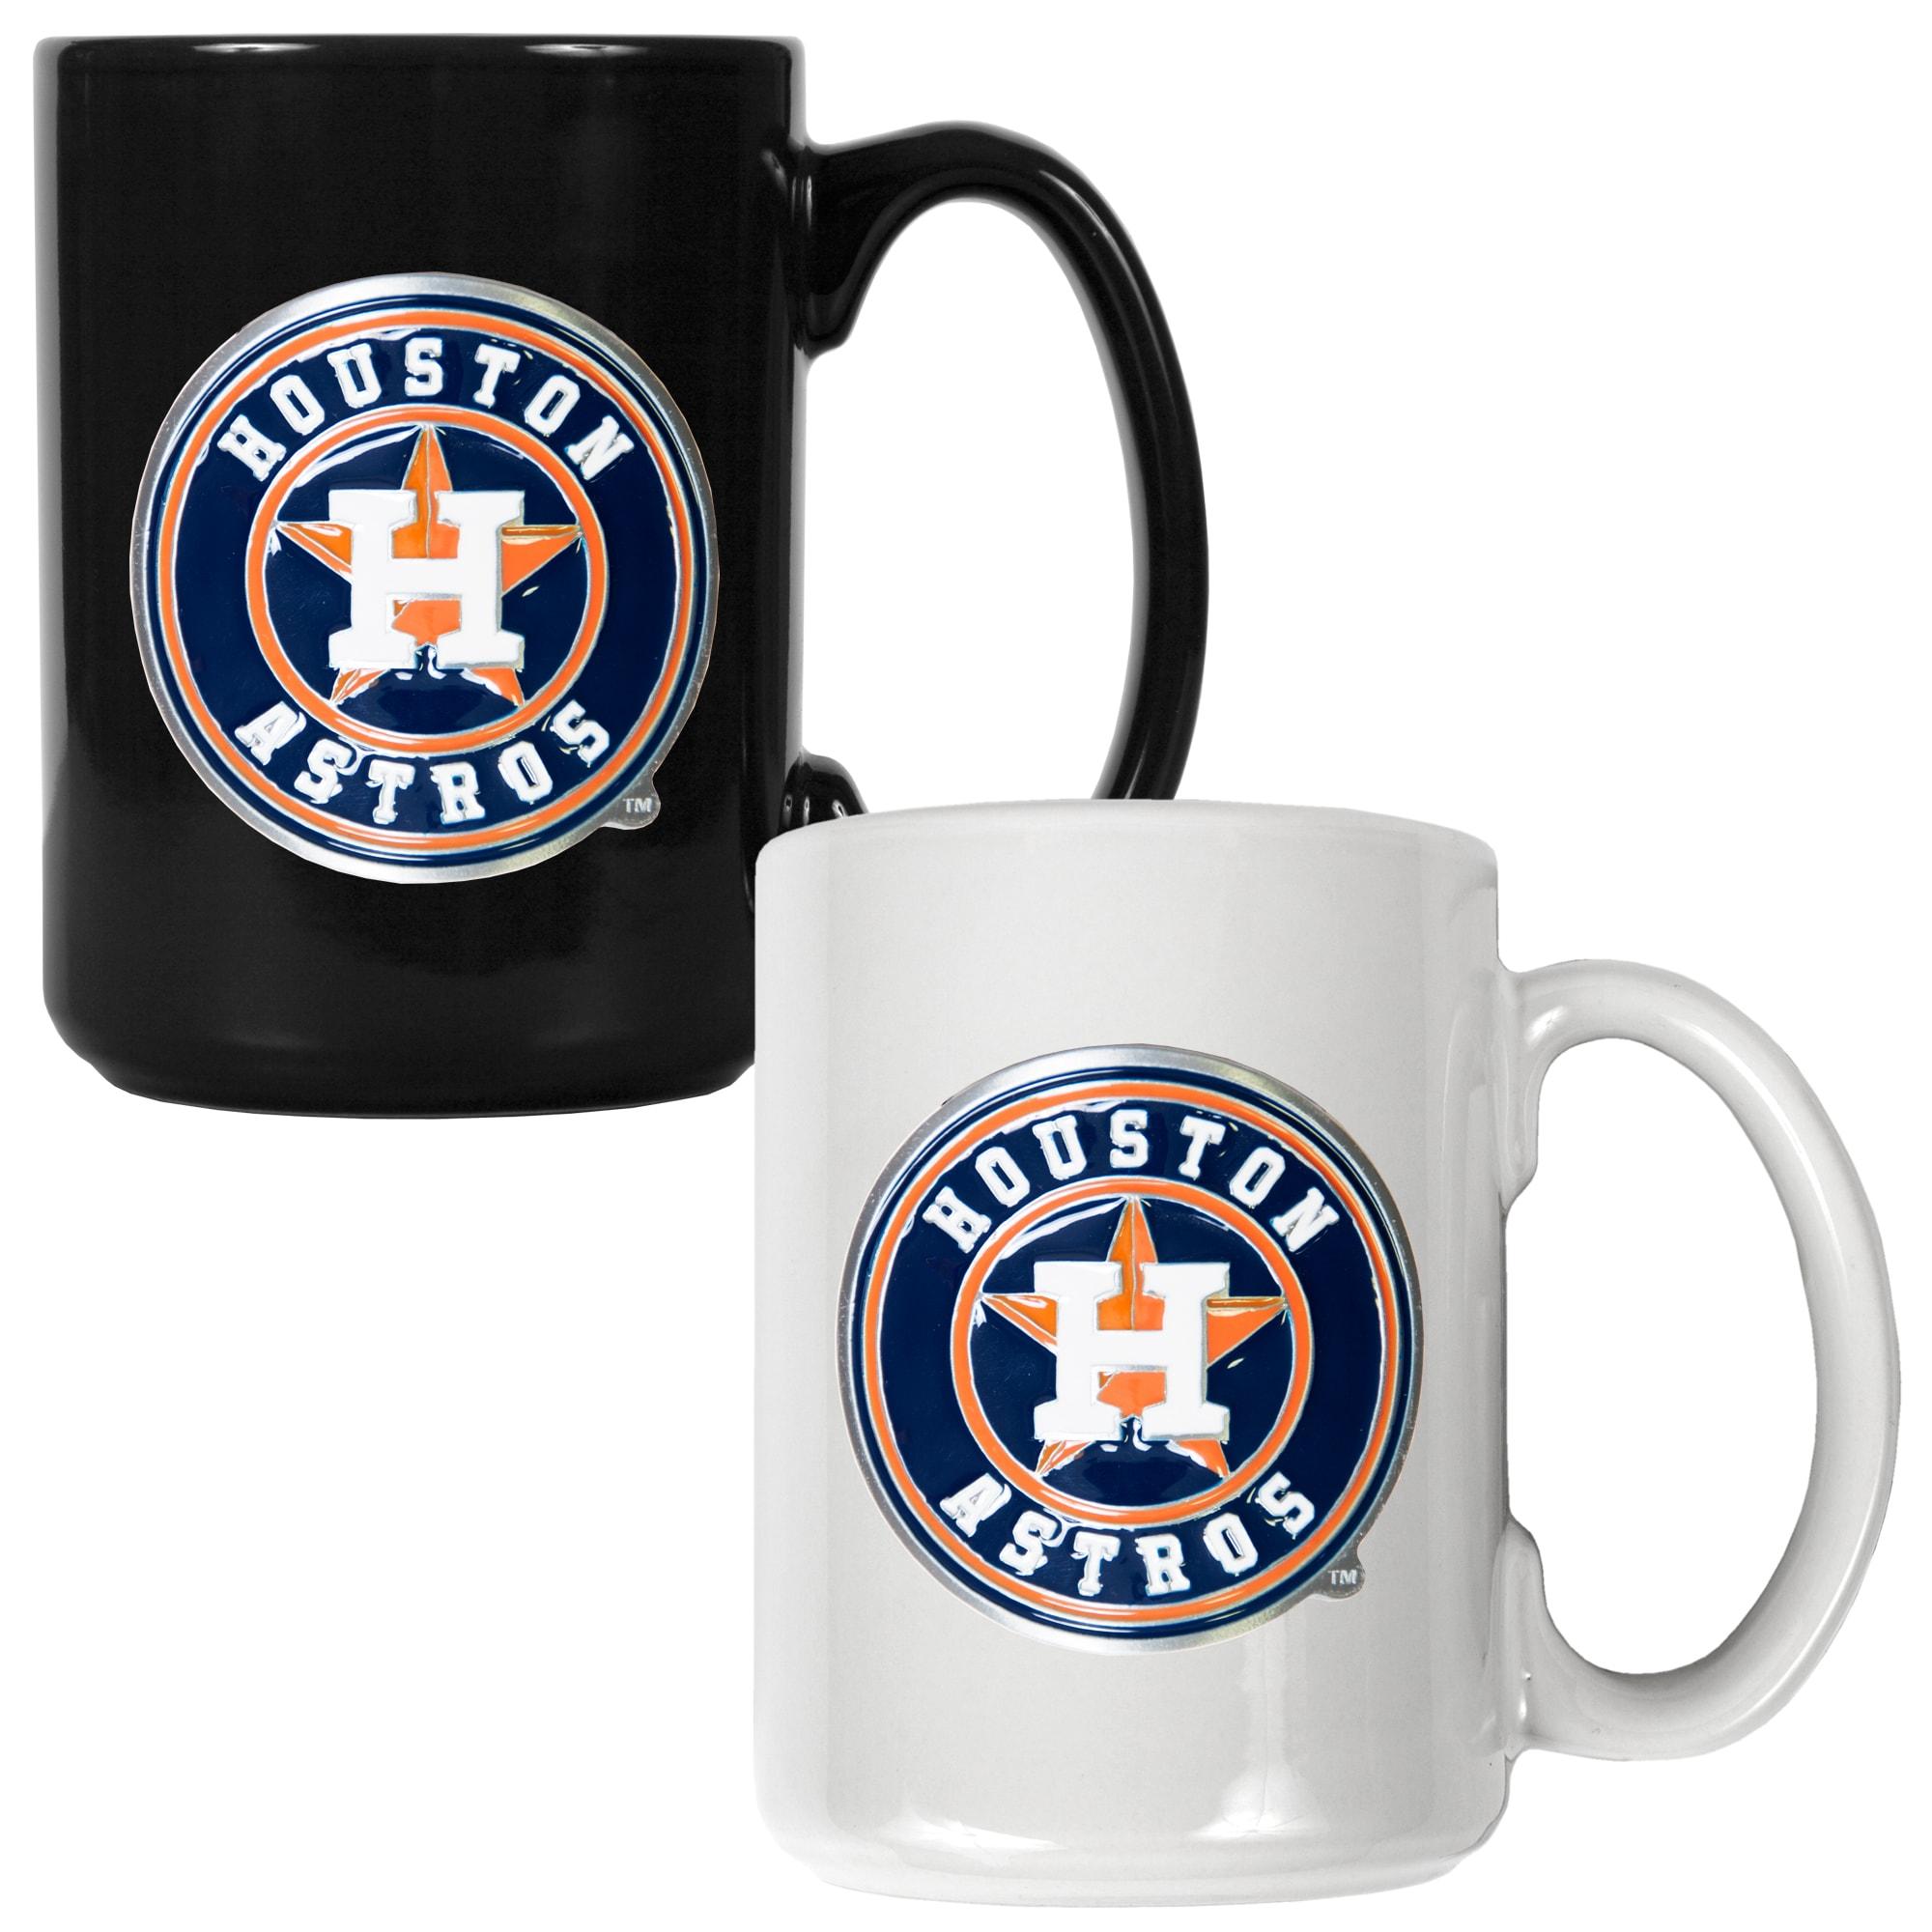 Houston Astros 15oz. Coffee Mug Set